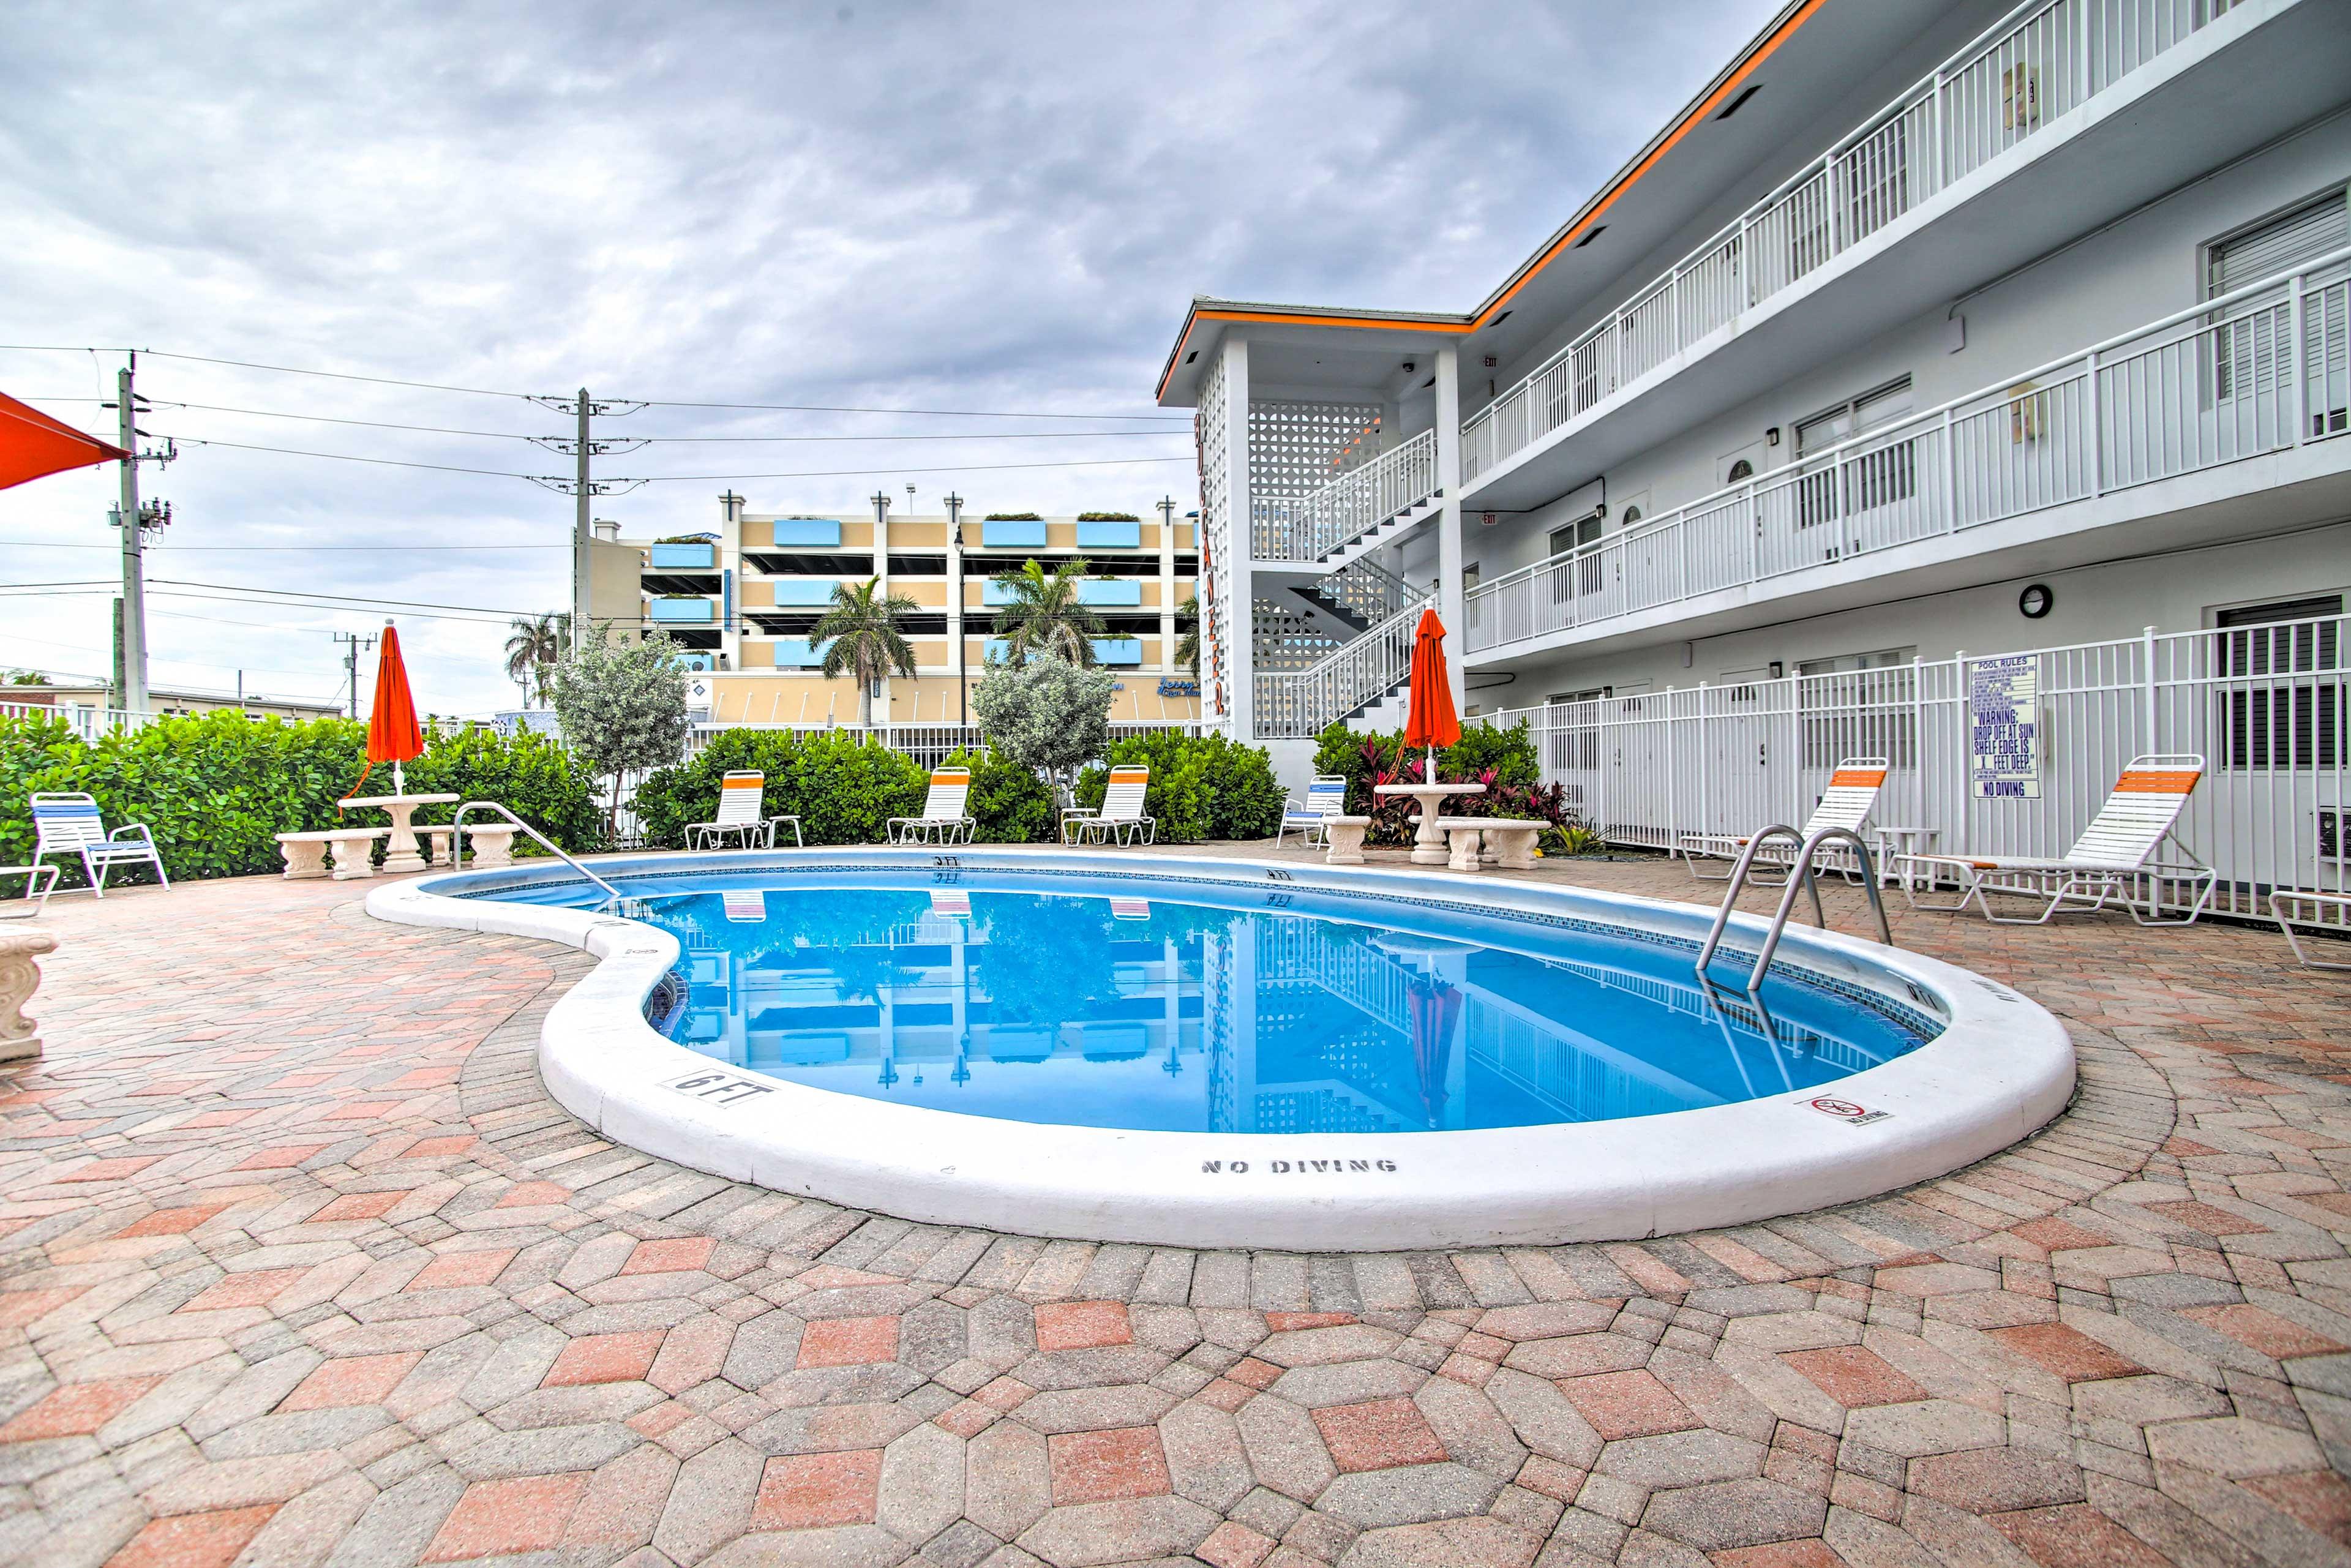 Deerfield Beach Vacation Rental Condo   1BR   1BA   400 Sq Ft   1st Floor